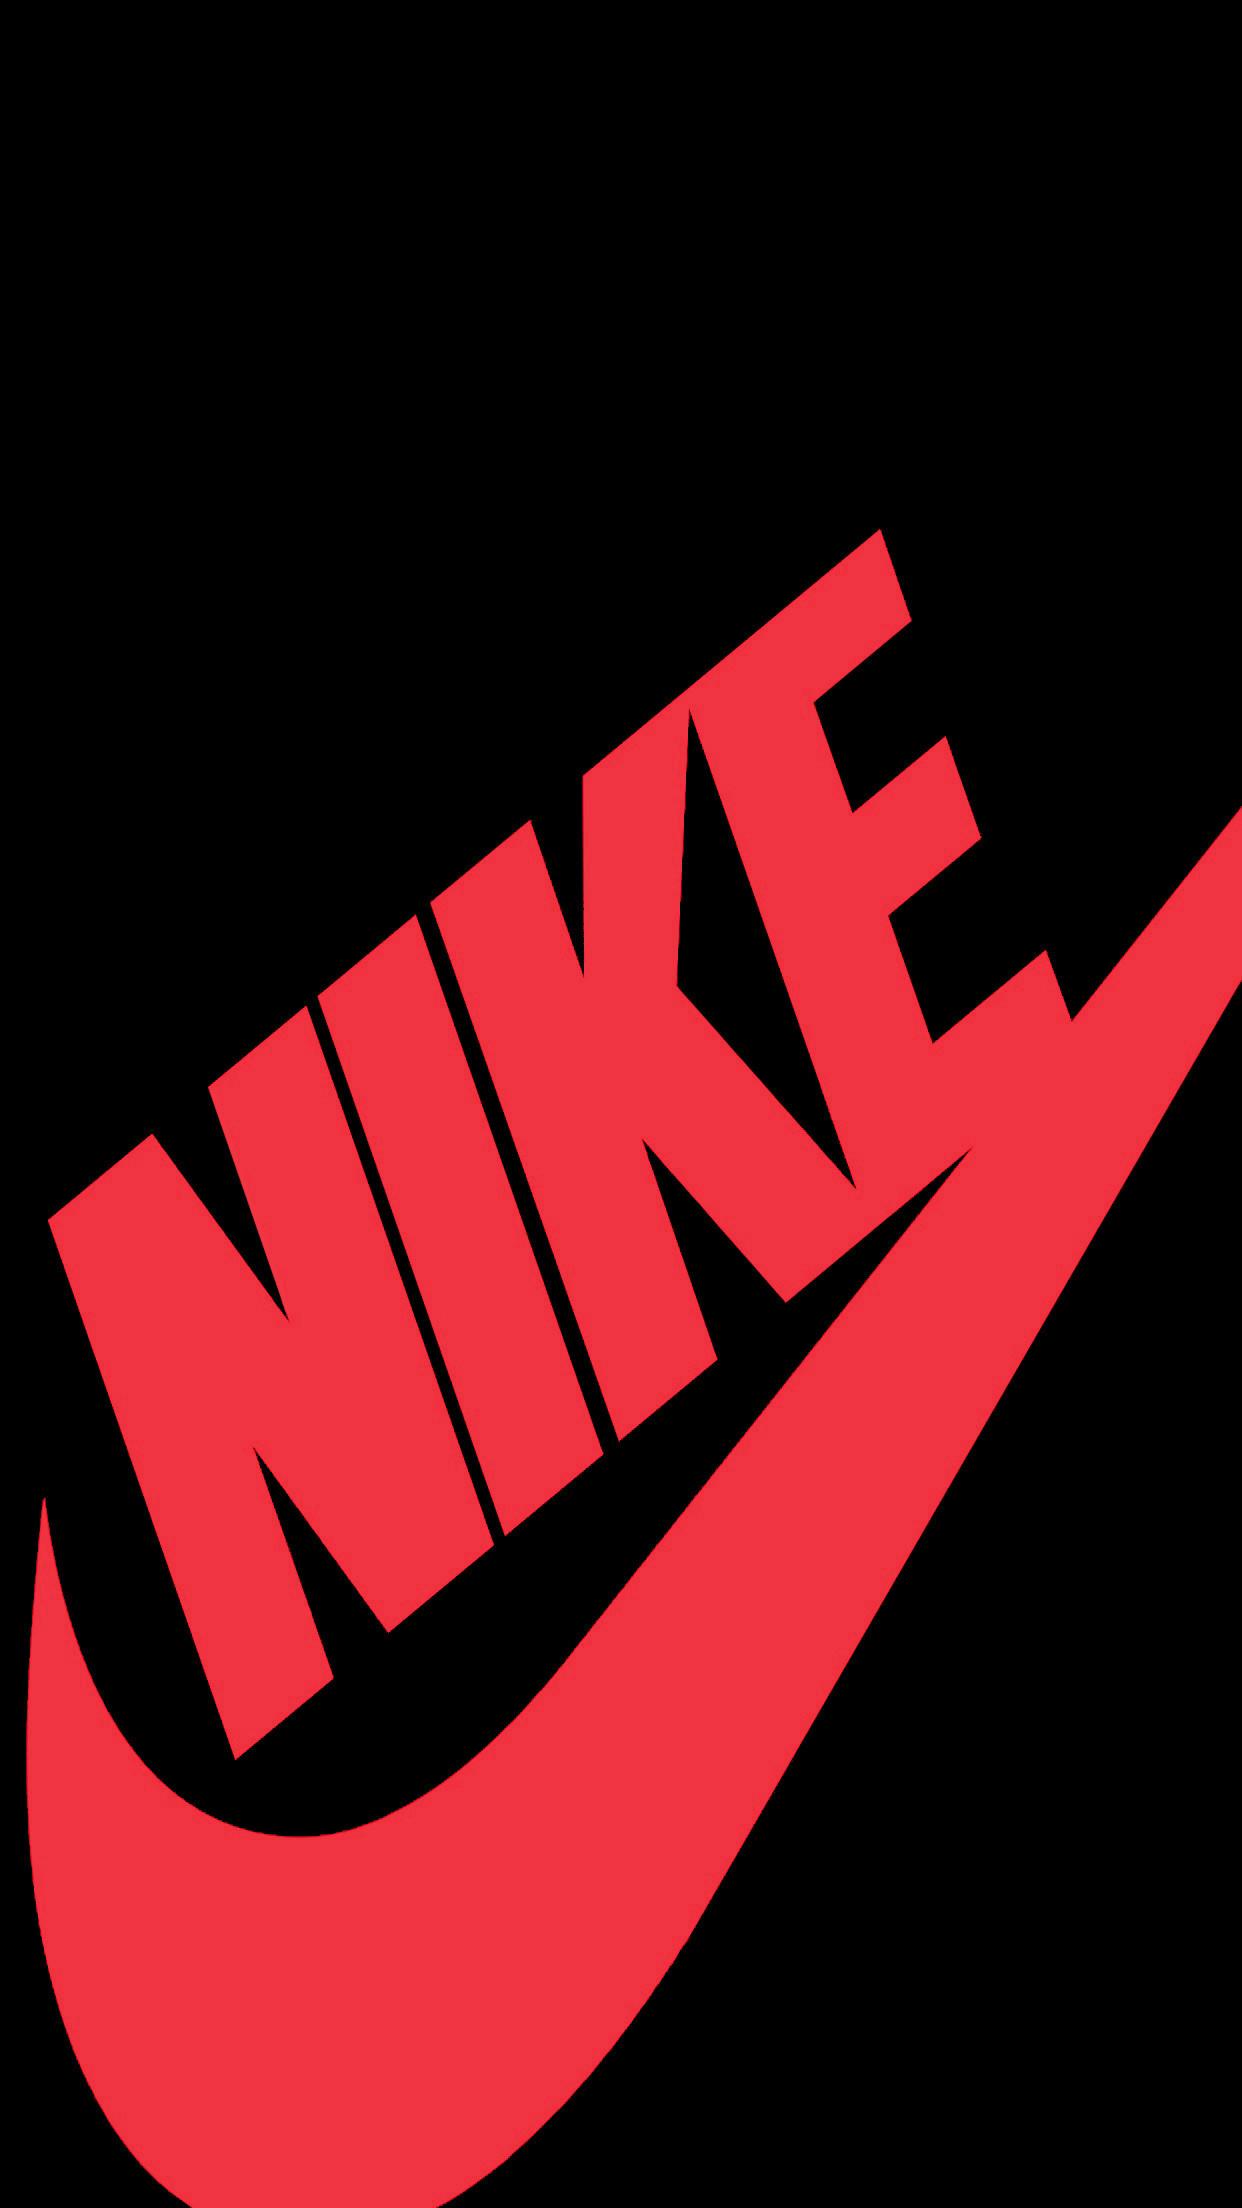 Nike Wallpapers Hd 2018 Wallpapertag